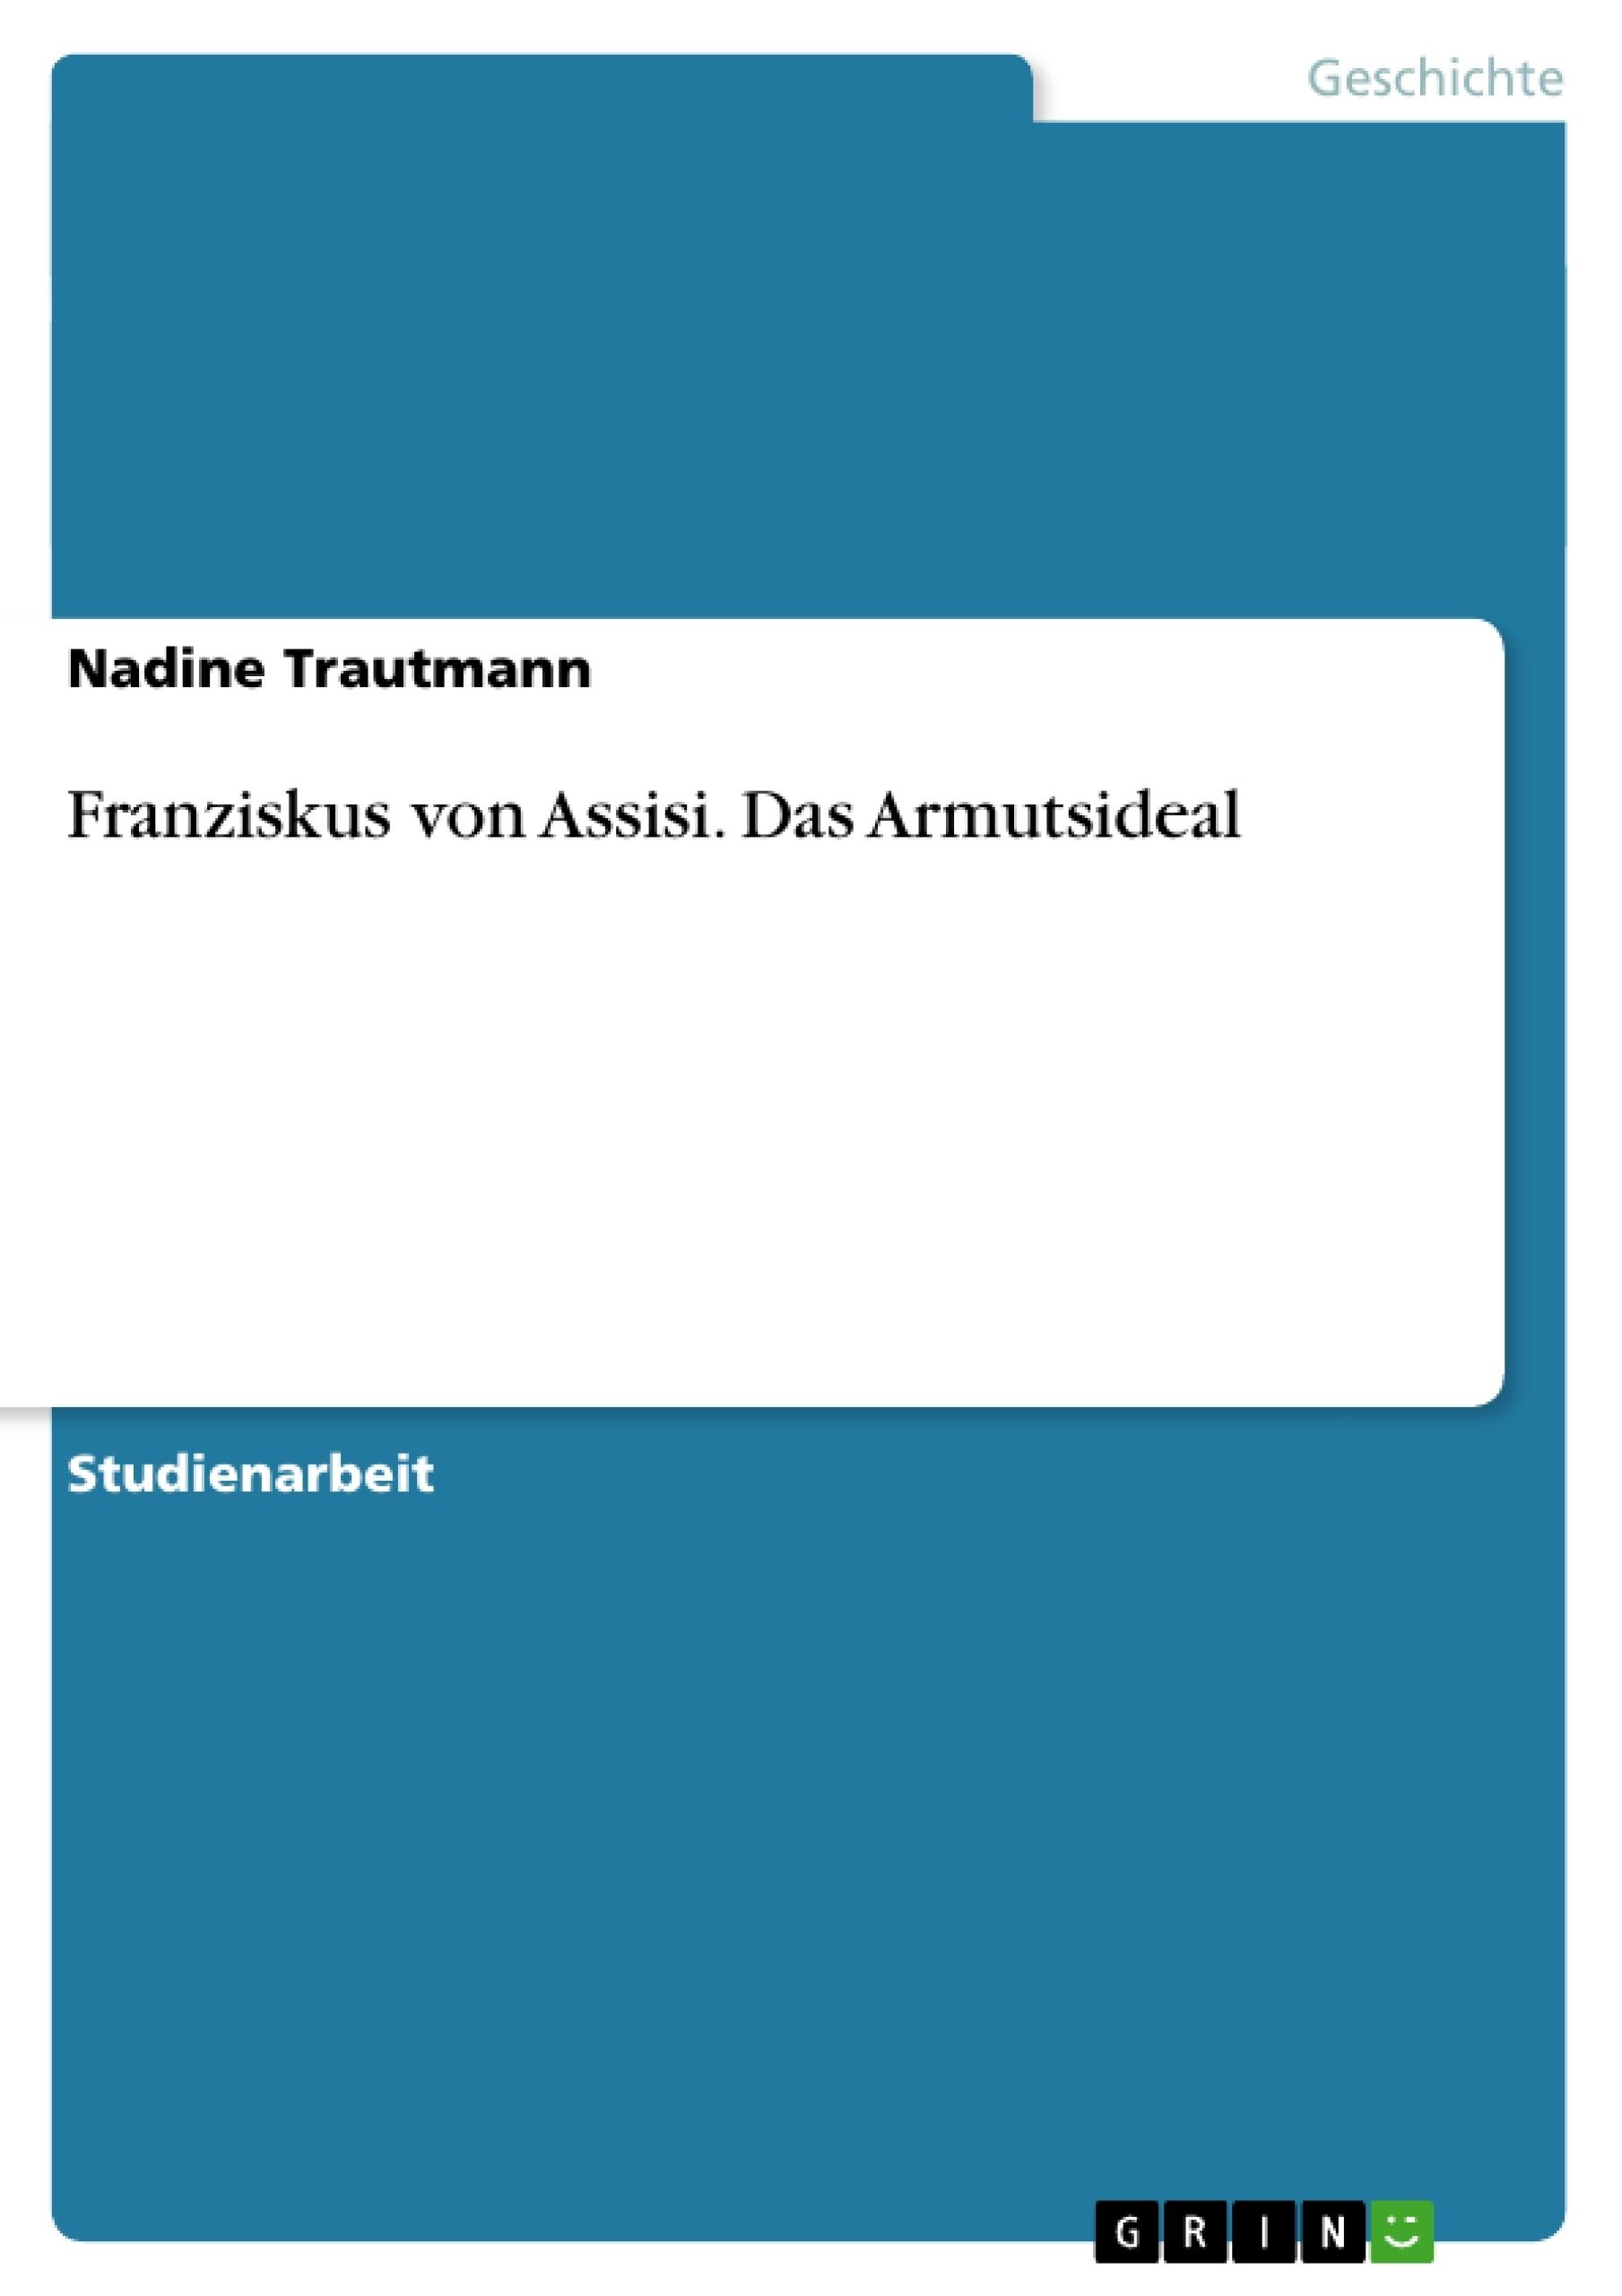 Titel: Franziskus von Assisi. Das Armutsideal